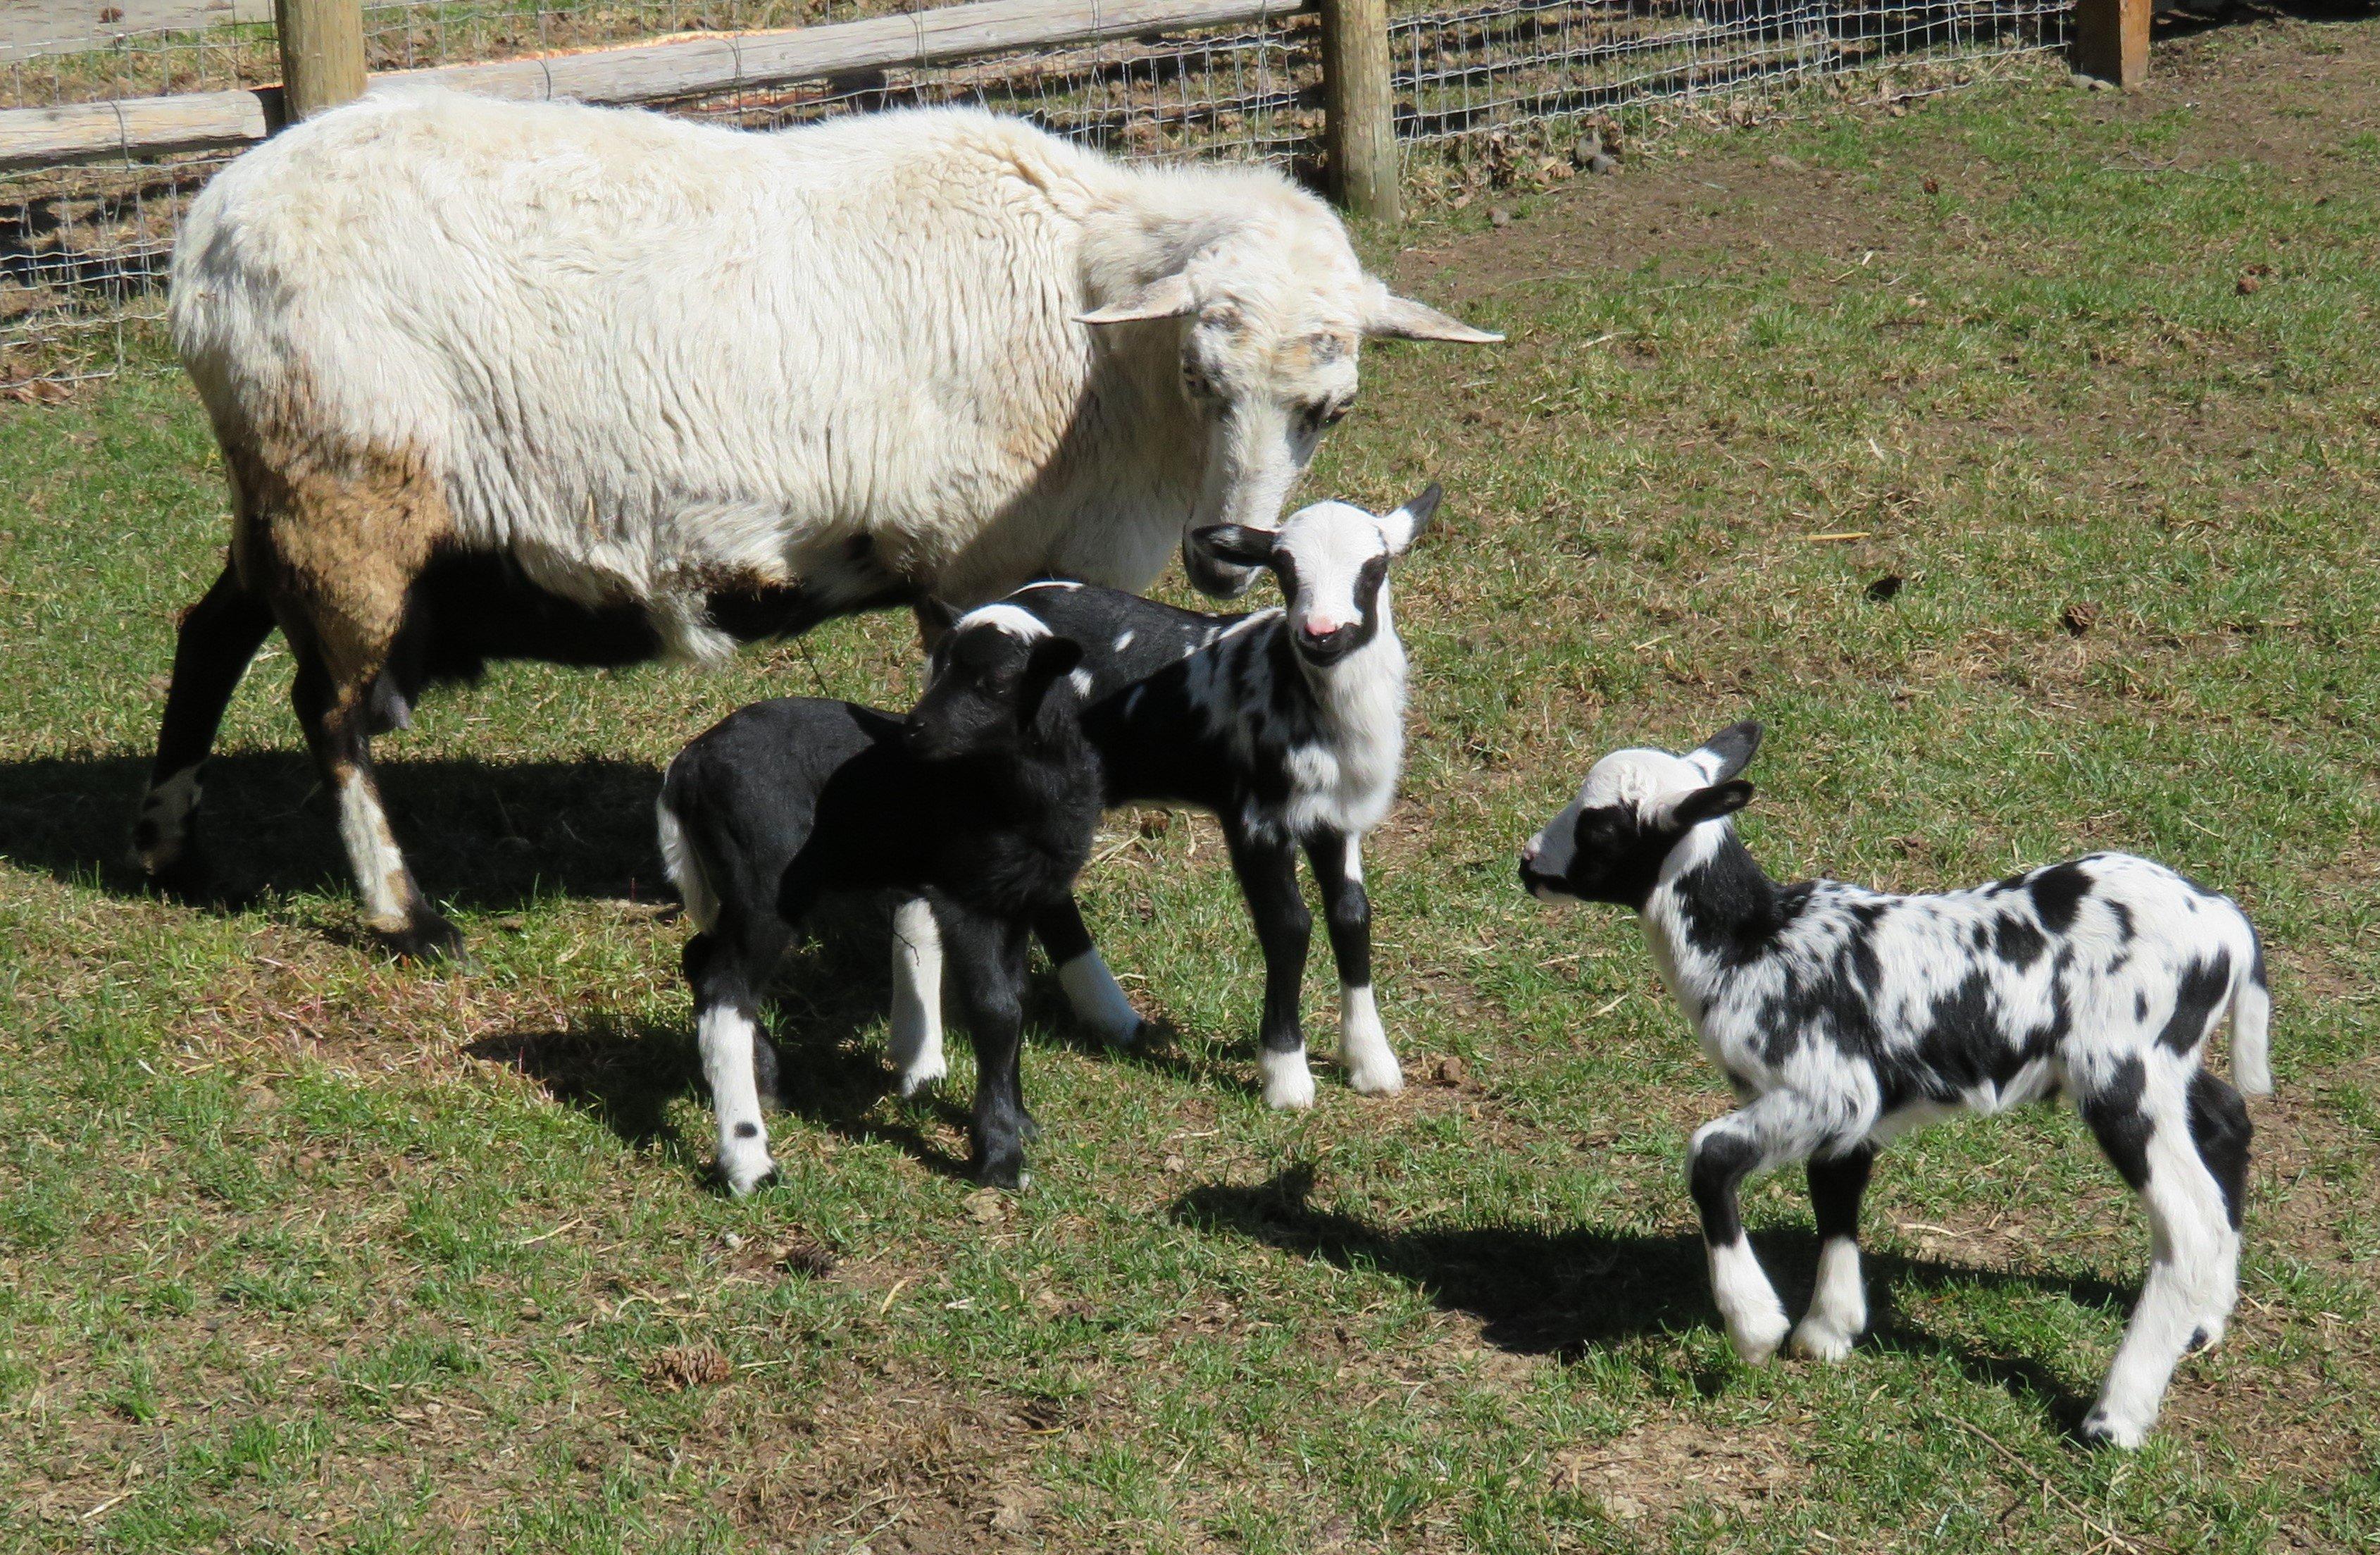 Joy & 3 ram lambs Ram C $300(sold), B $400(sold), A $400(sold)